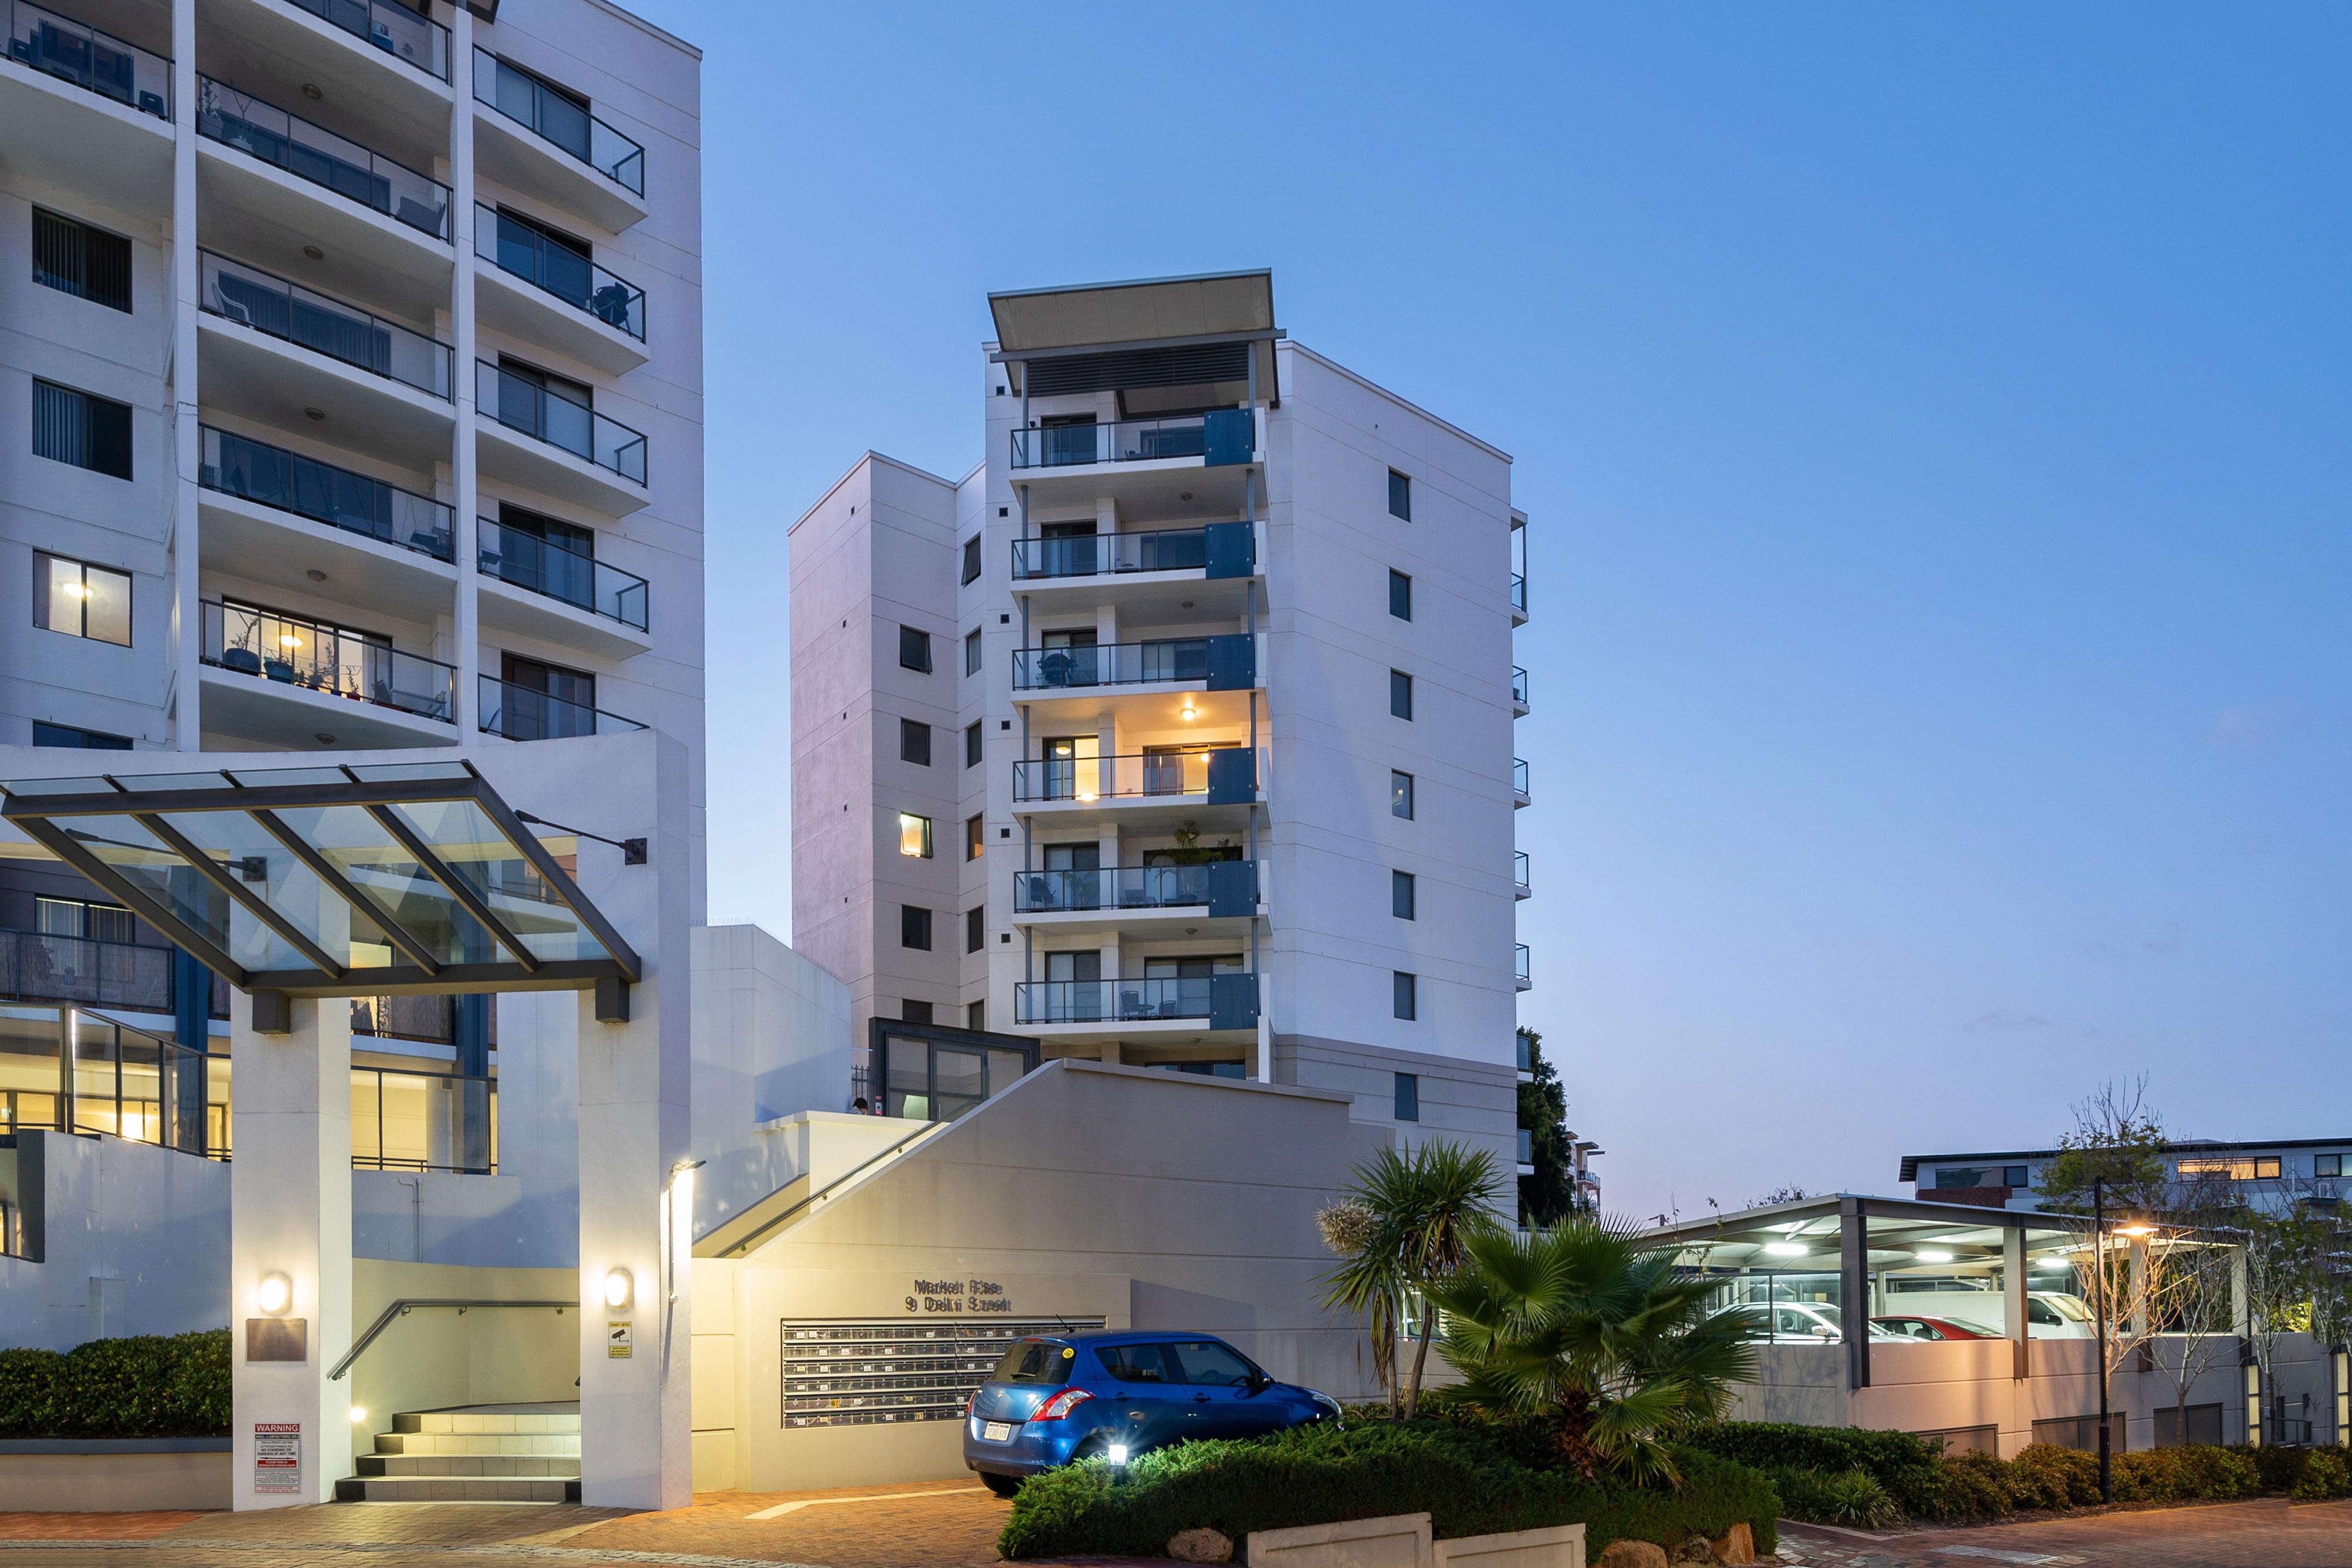 PRINT 86_9 Delhi St, West Perth 33